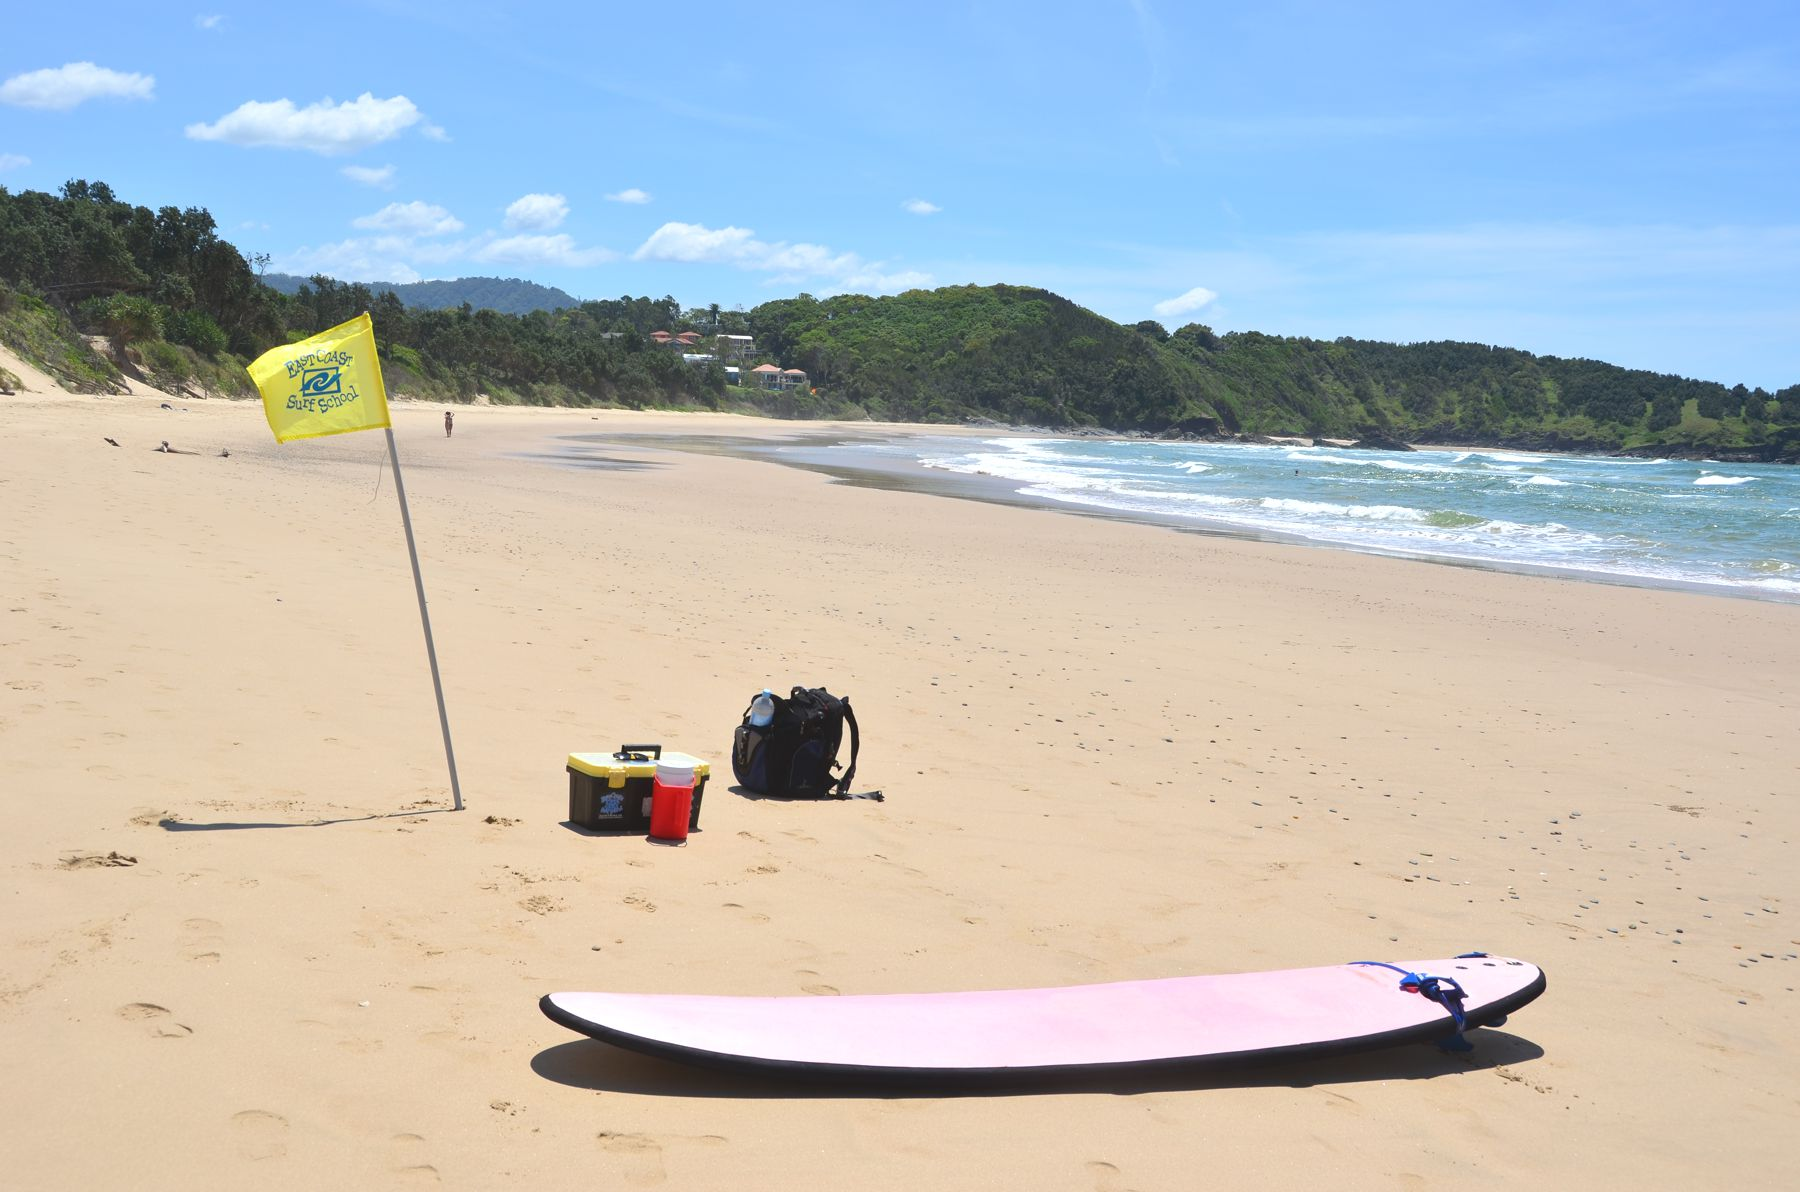 East Coast Surf School in Australia